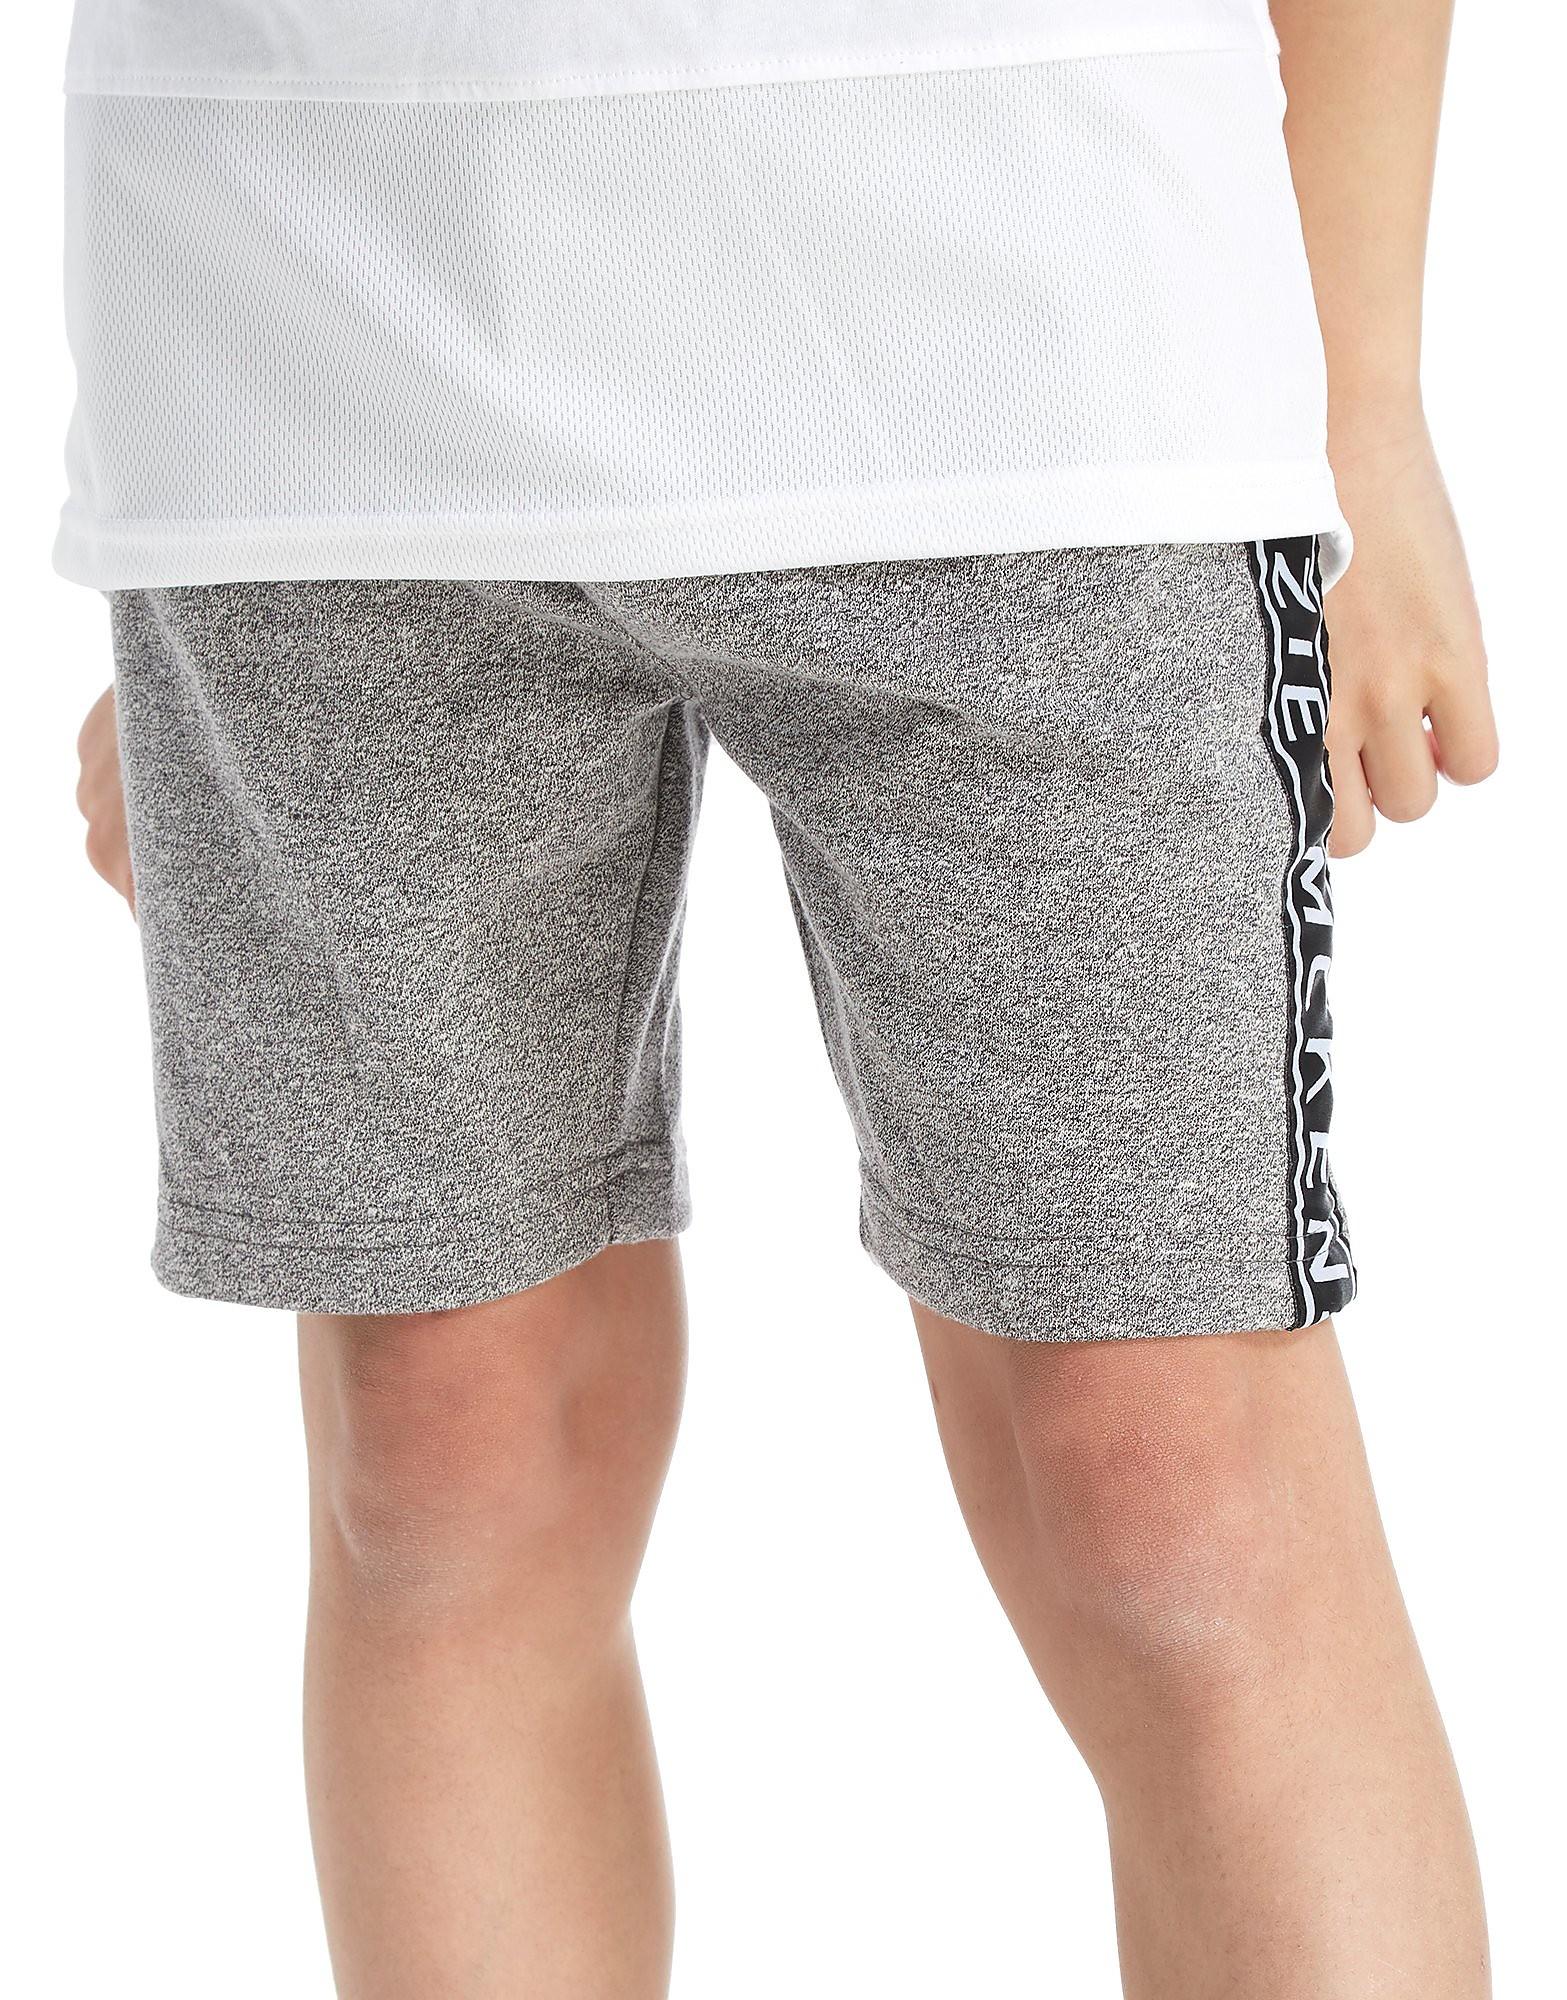 McKenzie Bensen Fleece Shorts Junior